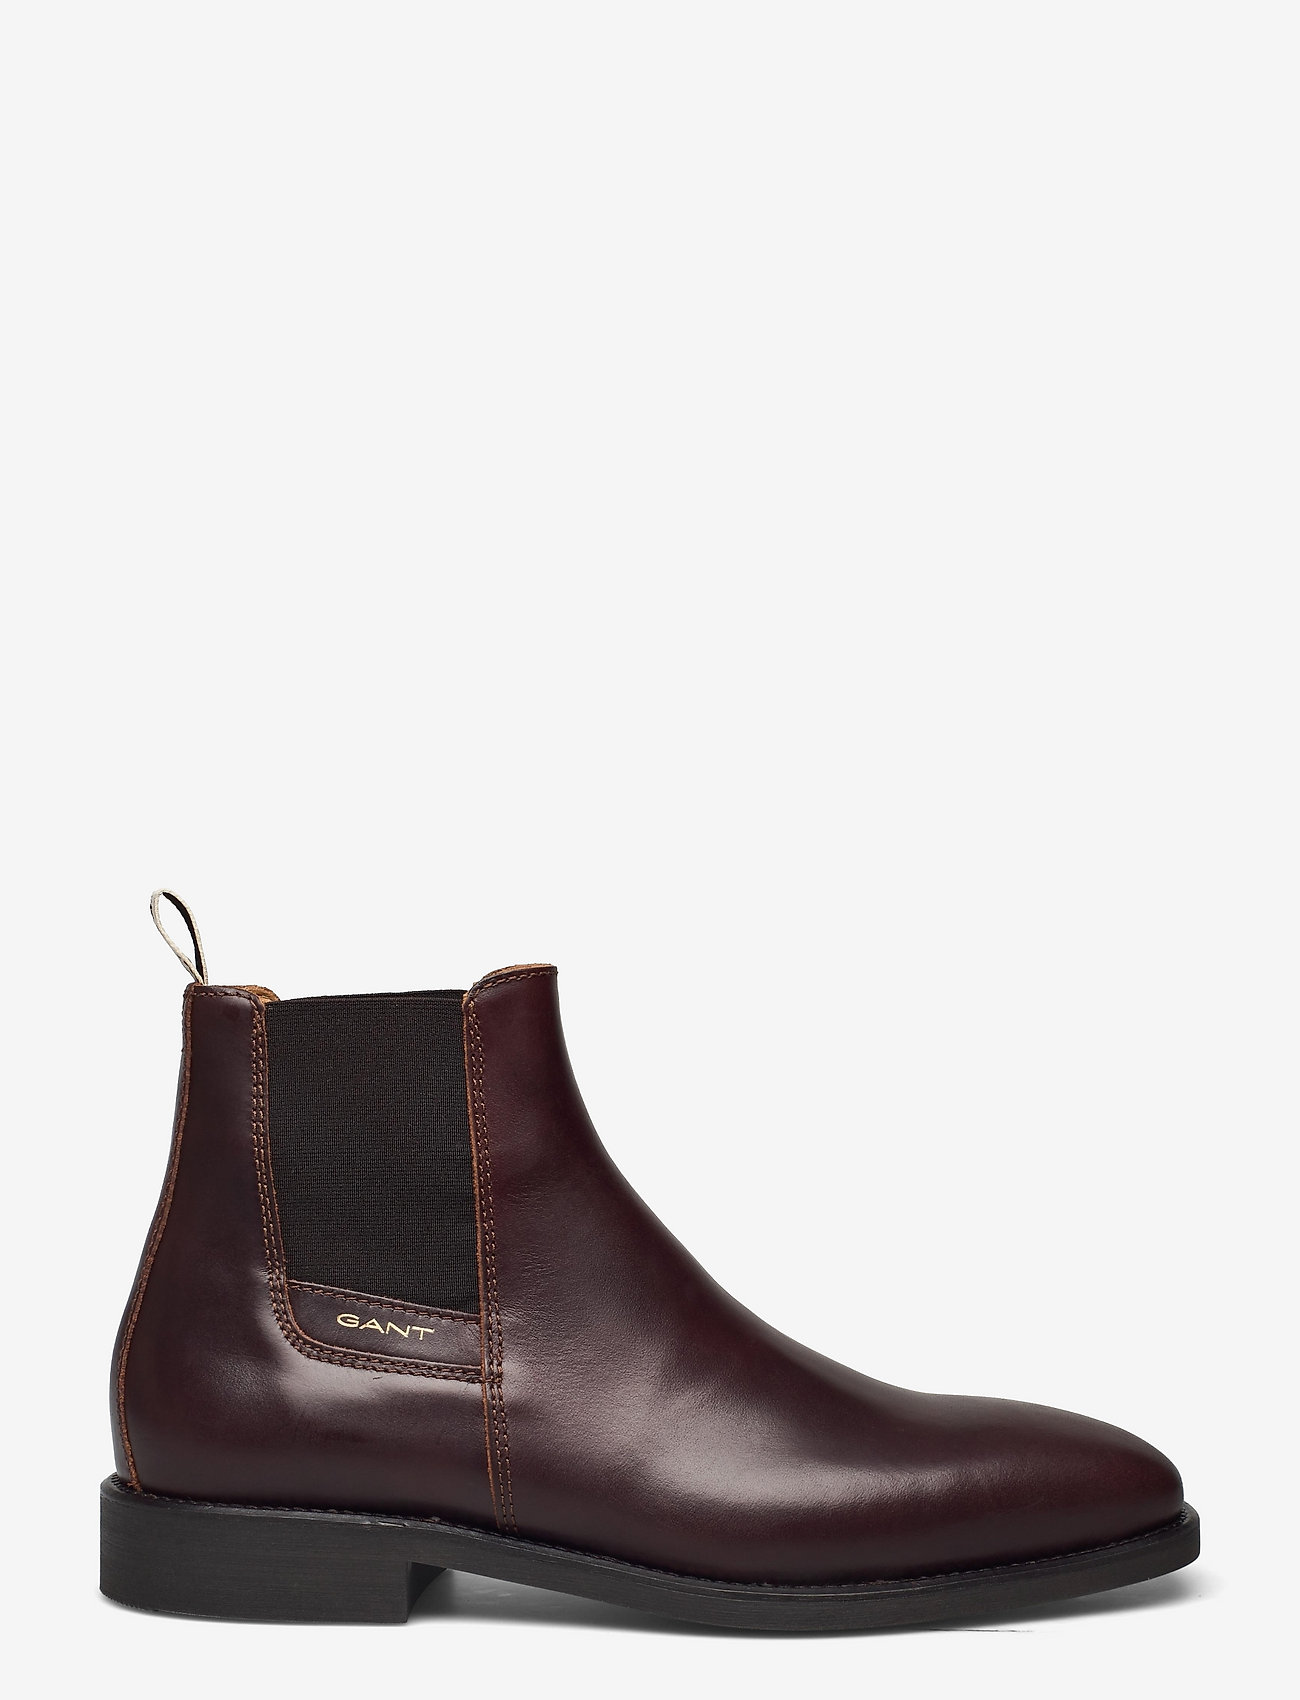 GANT - James chelsea boot - chelsea boots - sienna brown - 1